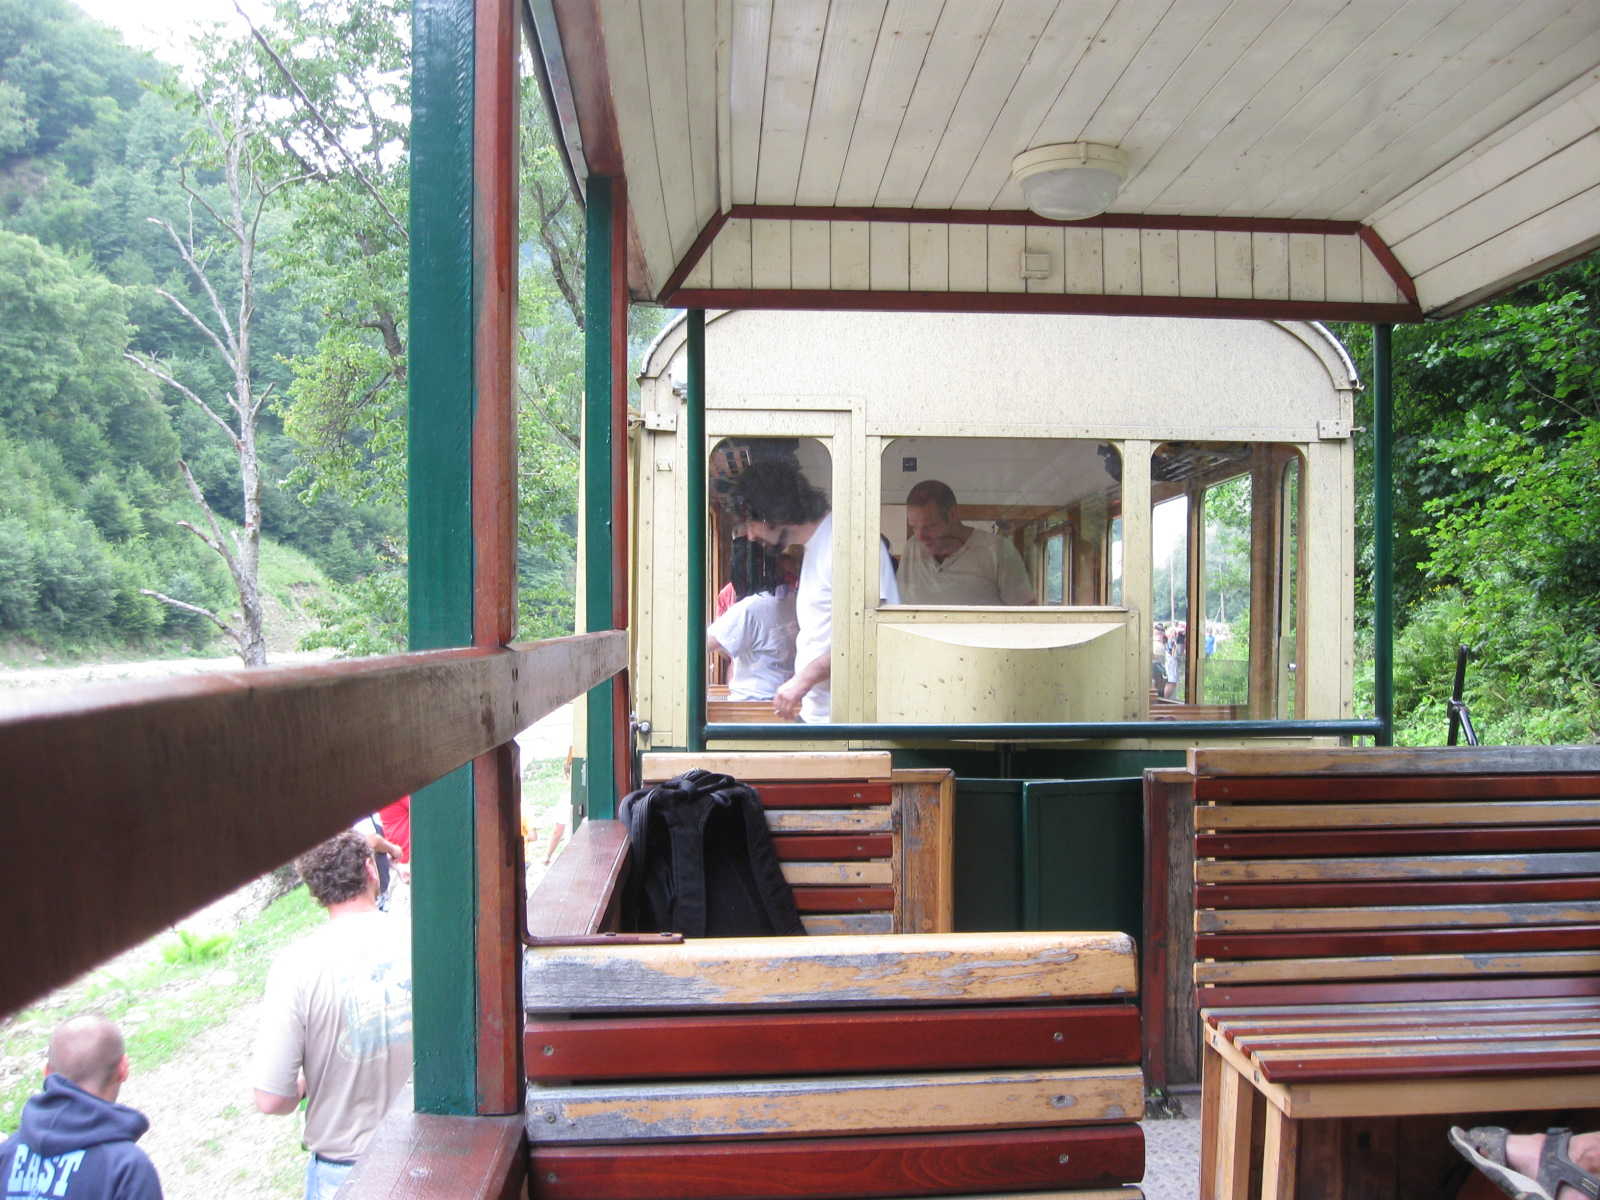 http://1.bp.blogspot.com/_s0KvrMgP5bs/TGmW9qMDIpI/AAAAAAAAAj4/3w4z0v2JOMo/s1600/scenes+from+a+train+006.JPG